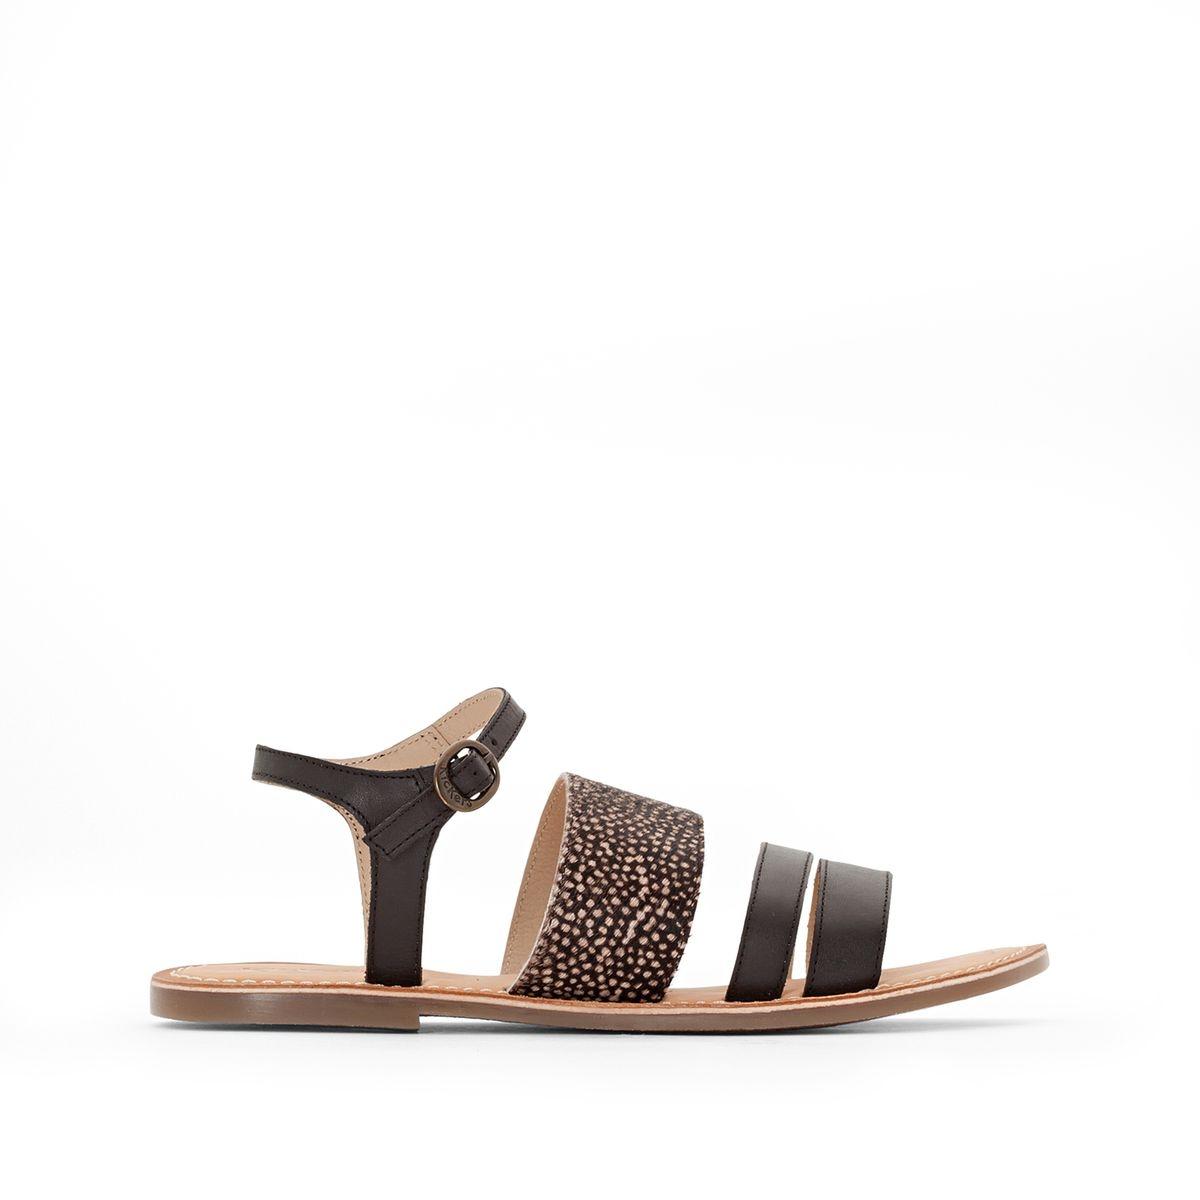 Sandales cuir Divatte